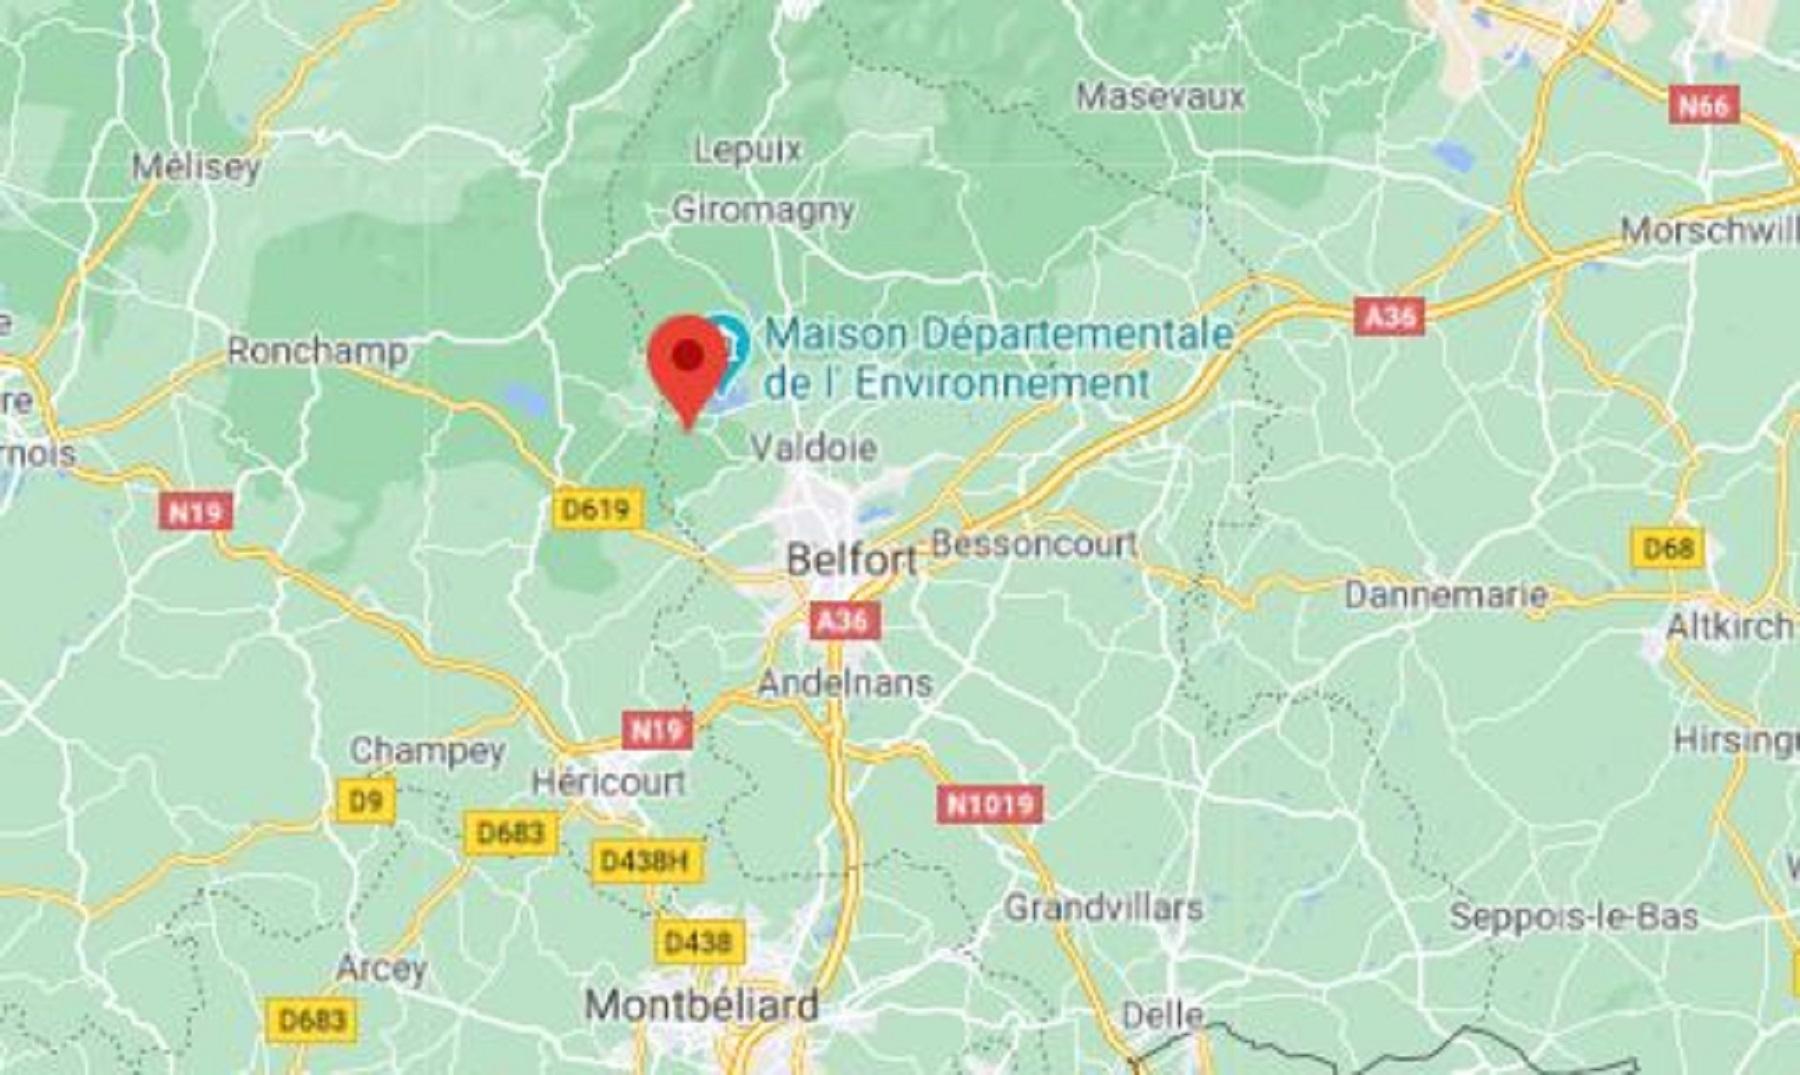 Evette-Salbert sur Google Maps.